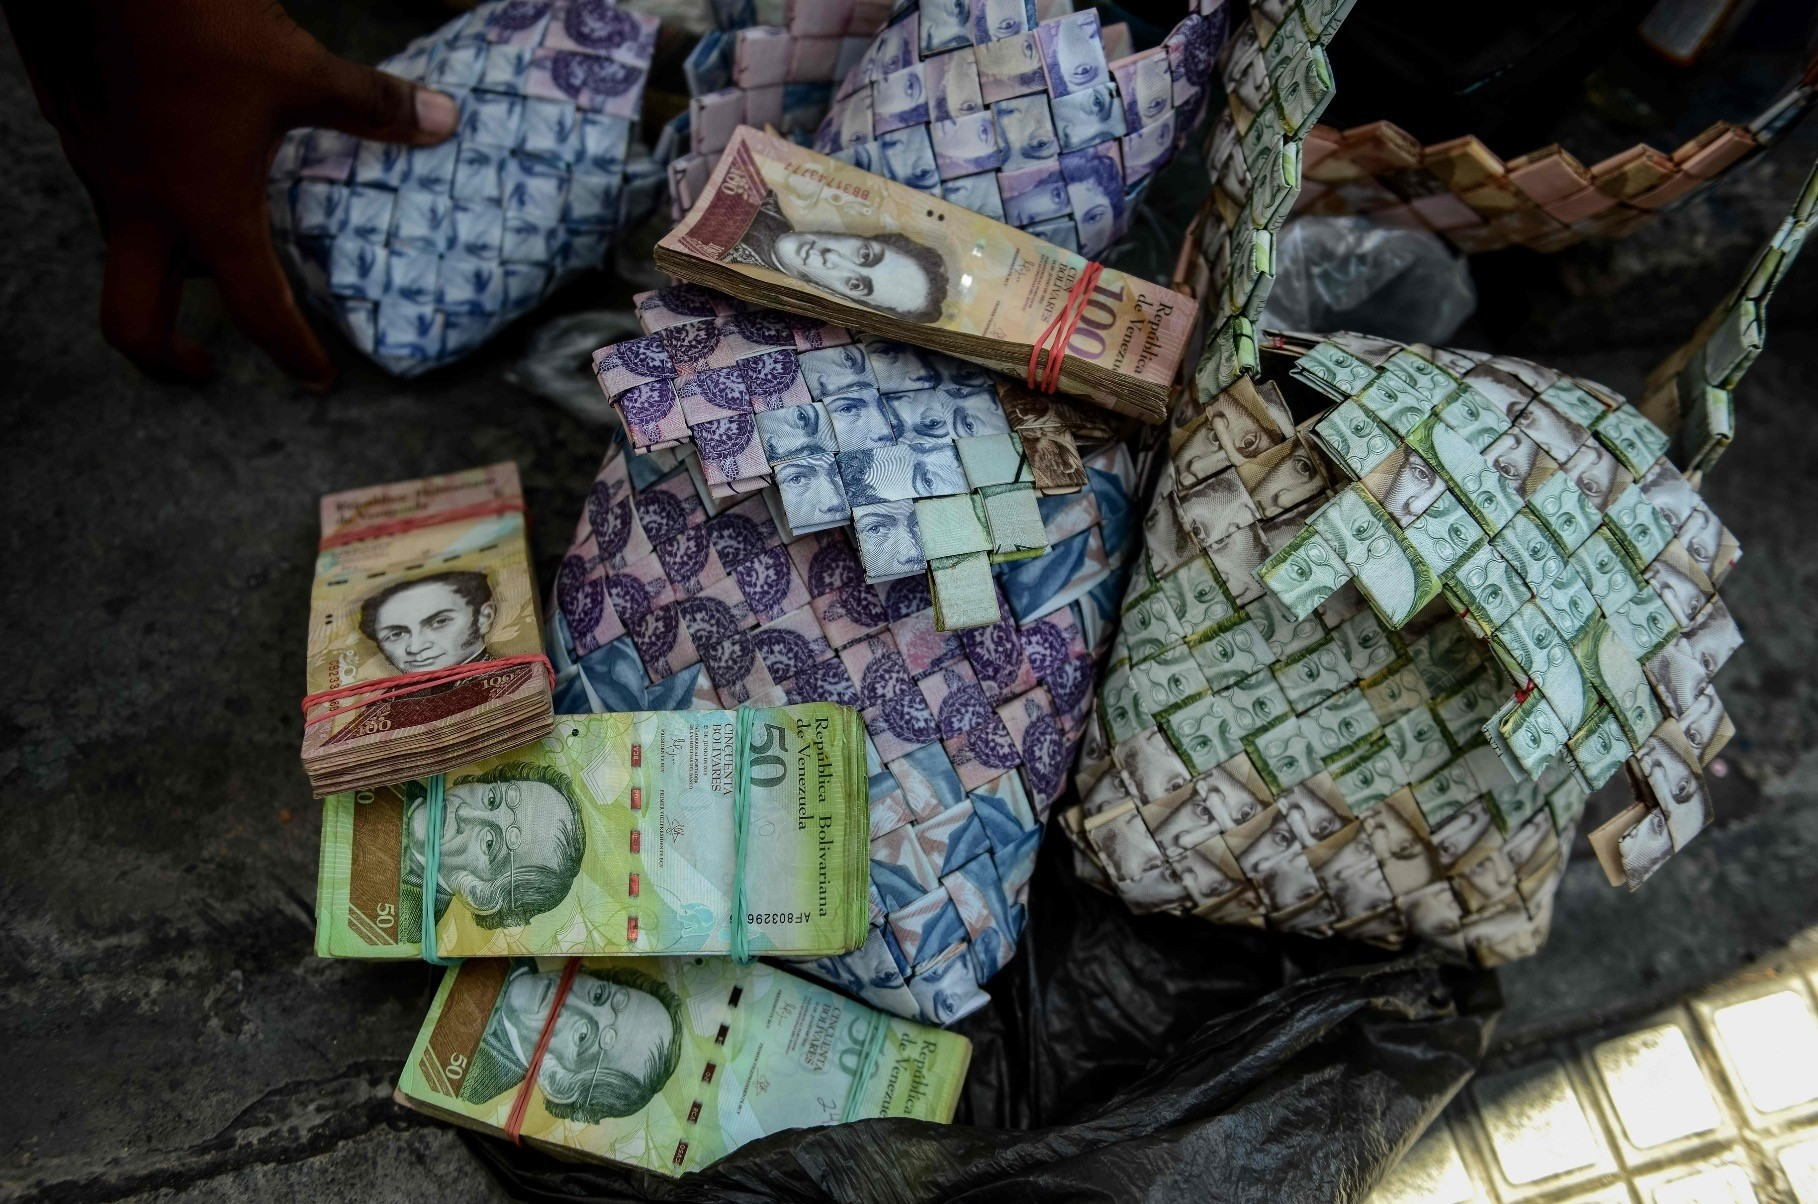 Wilmer Rojas, 25, shows the purses he makes, using Bolivar bills in Caracas.